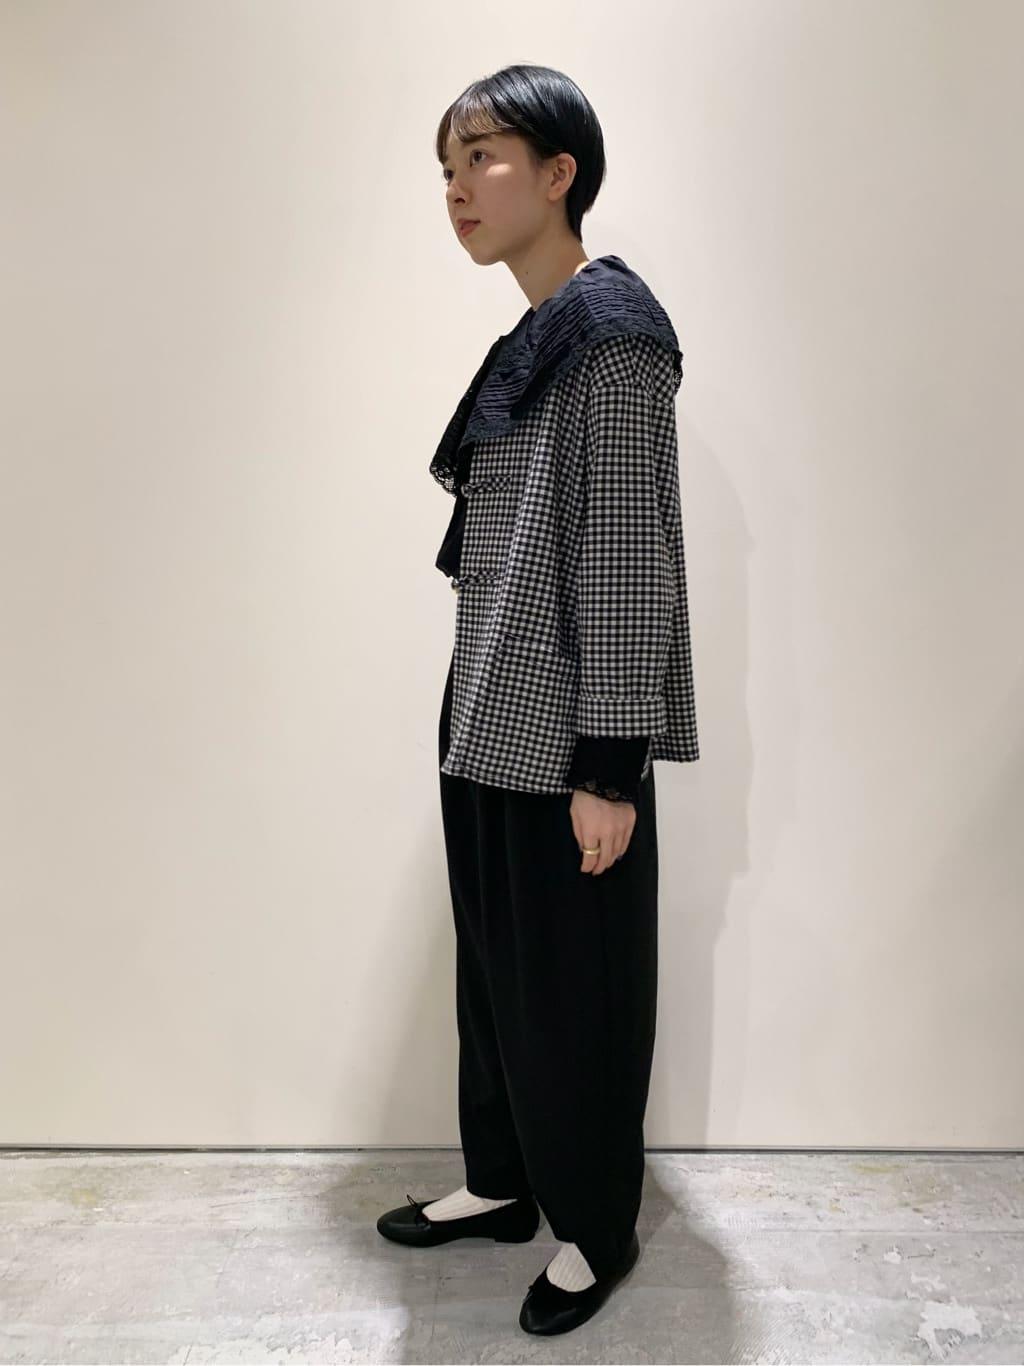 - CHILD WOMAN CHILD WOMAN , PAR ICI ルミネ横浜 身長:158cm 2021.09.09